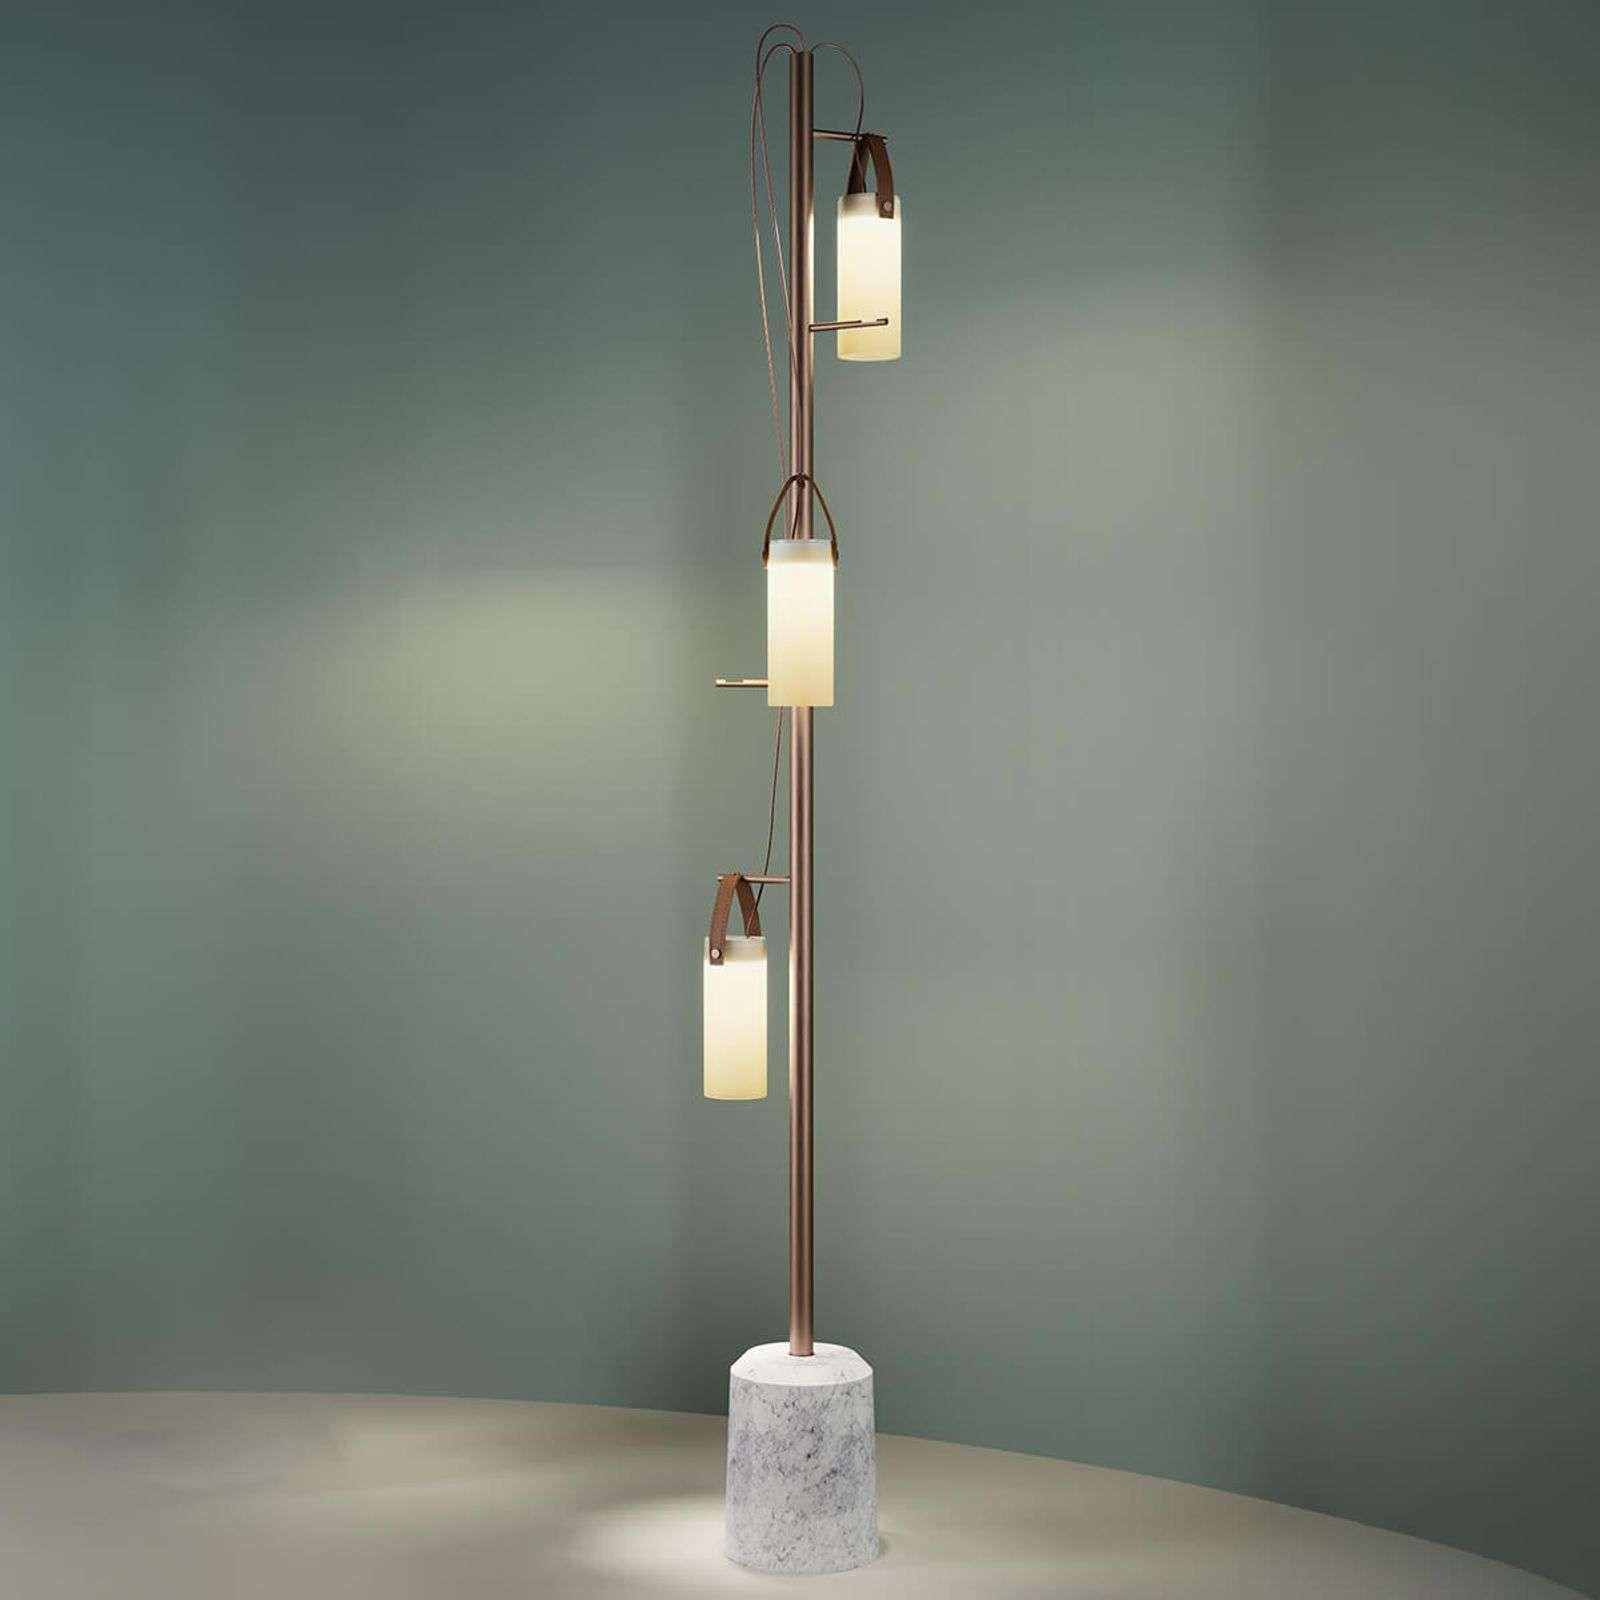 Led Design Vloerlamp Galerie Met 3 Lampen Vloerlamp Lampen Led